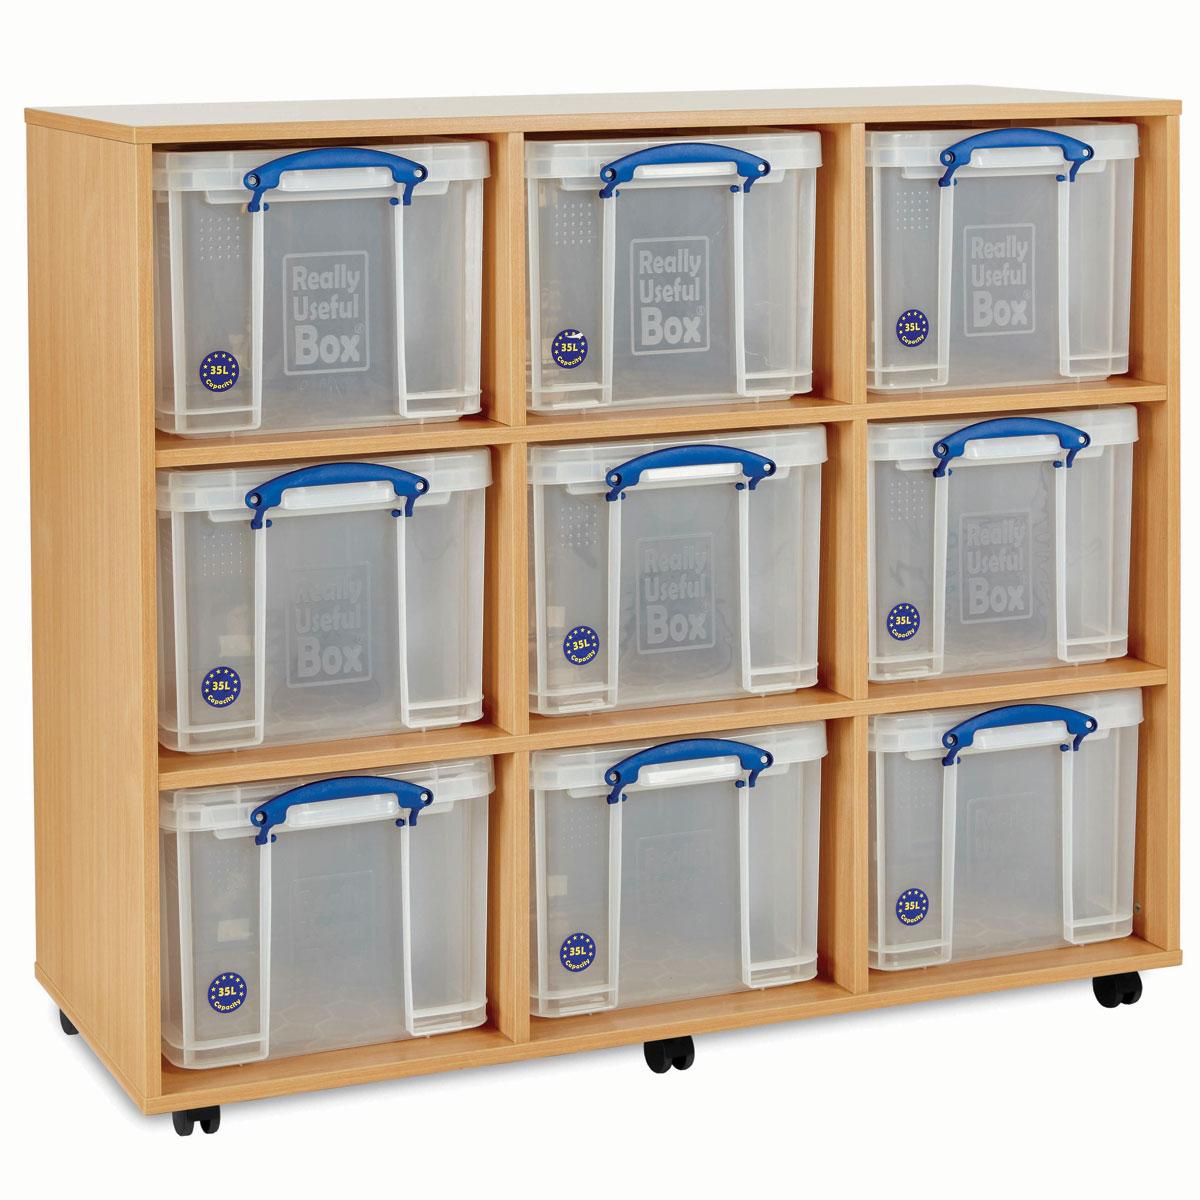 The Purpose Of Using Plastic Box Storage Units These Days